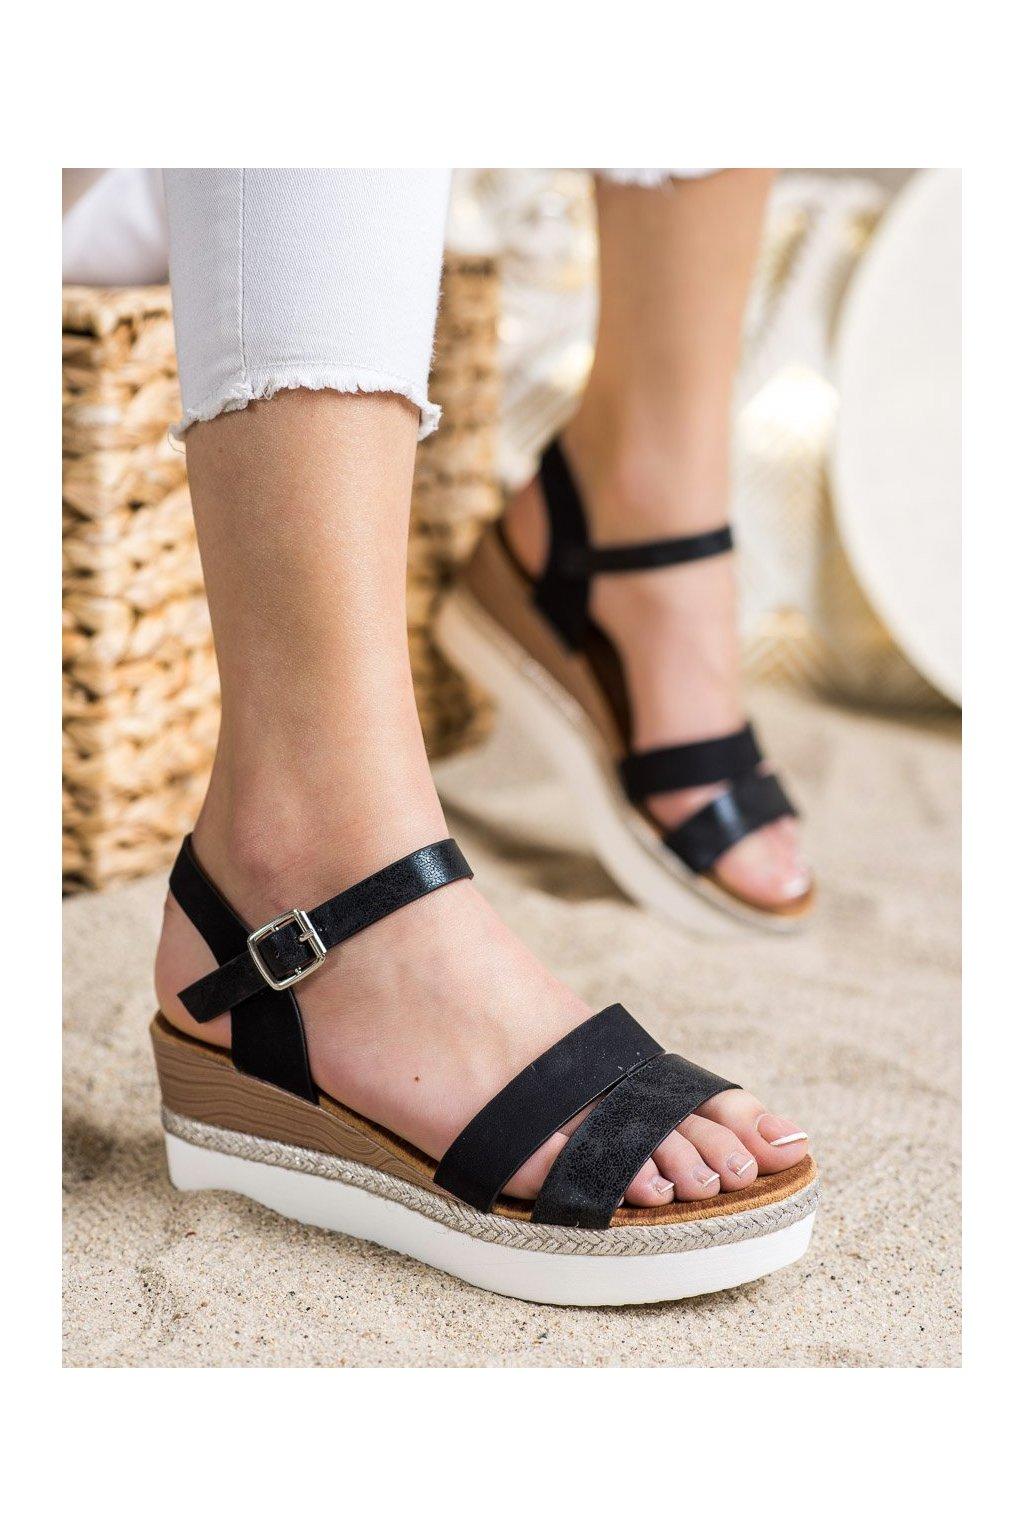 Čierne sandále Shelovet kod W980B